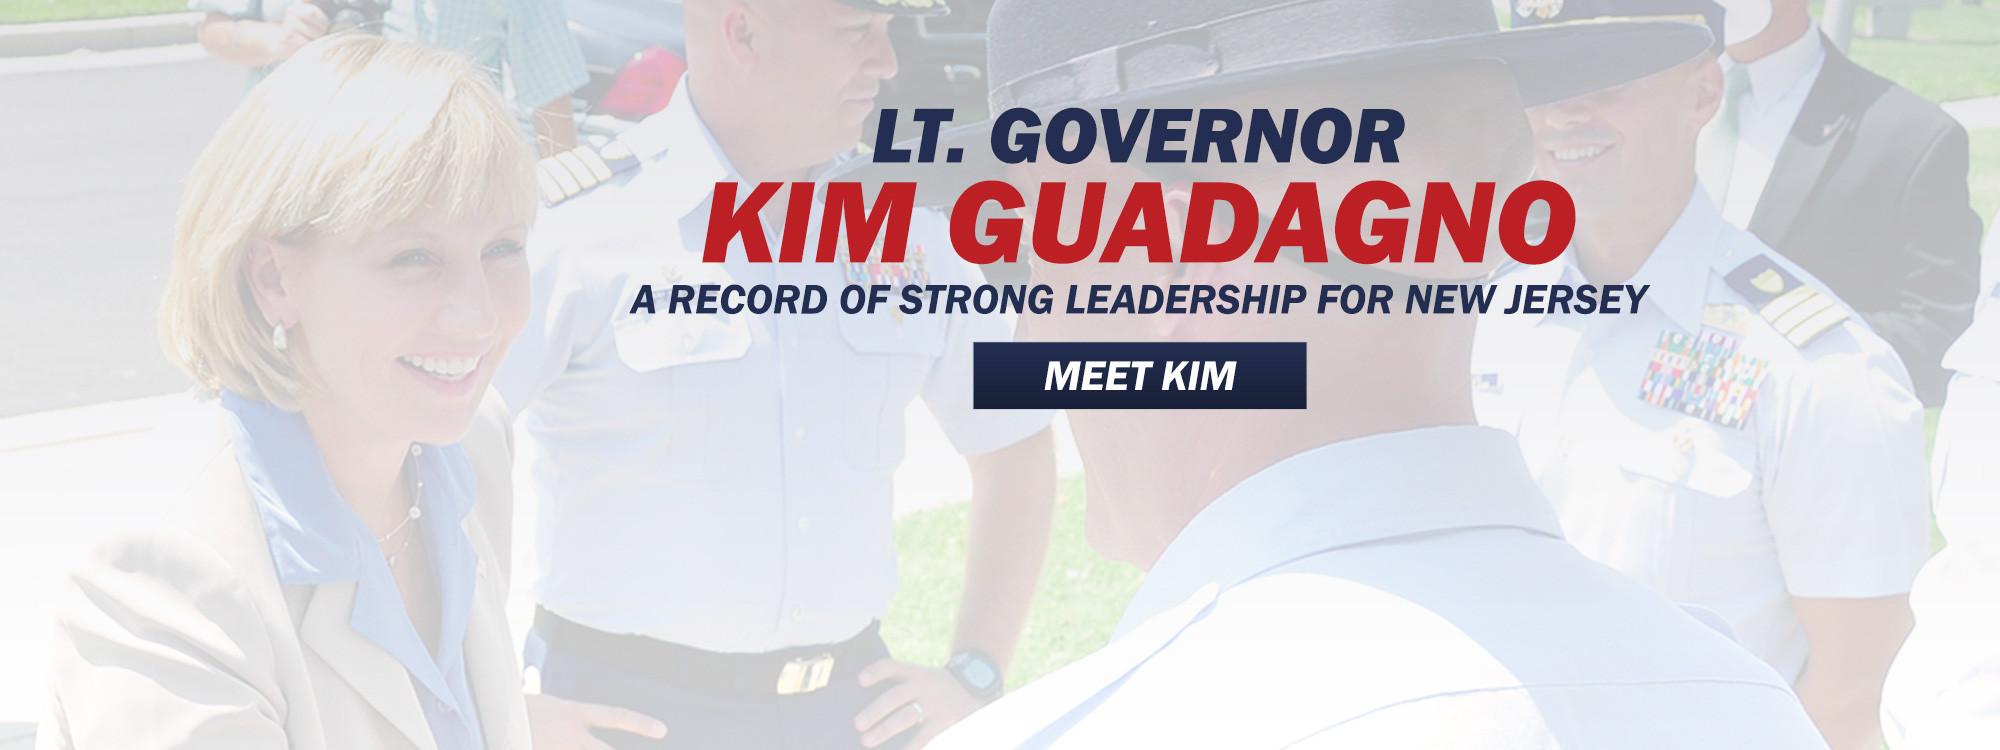 Lt. Governor Kim Guadagno